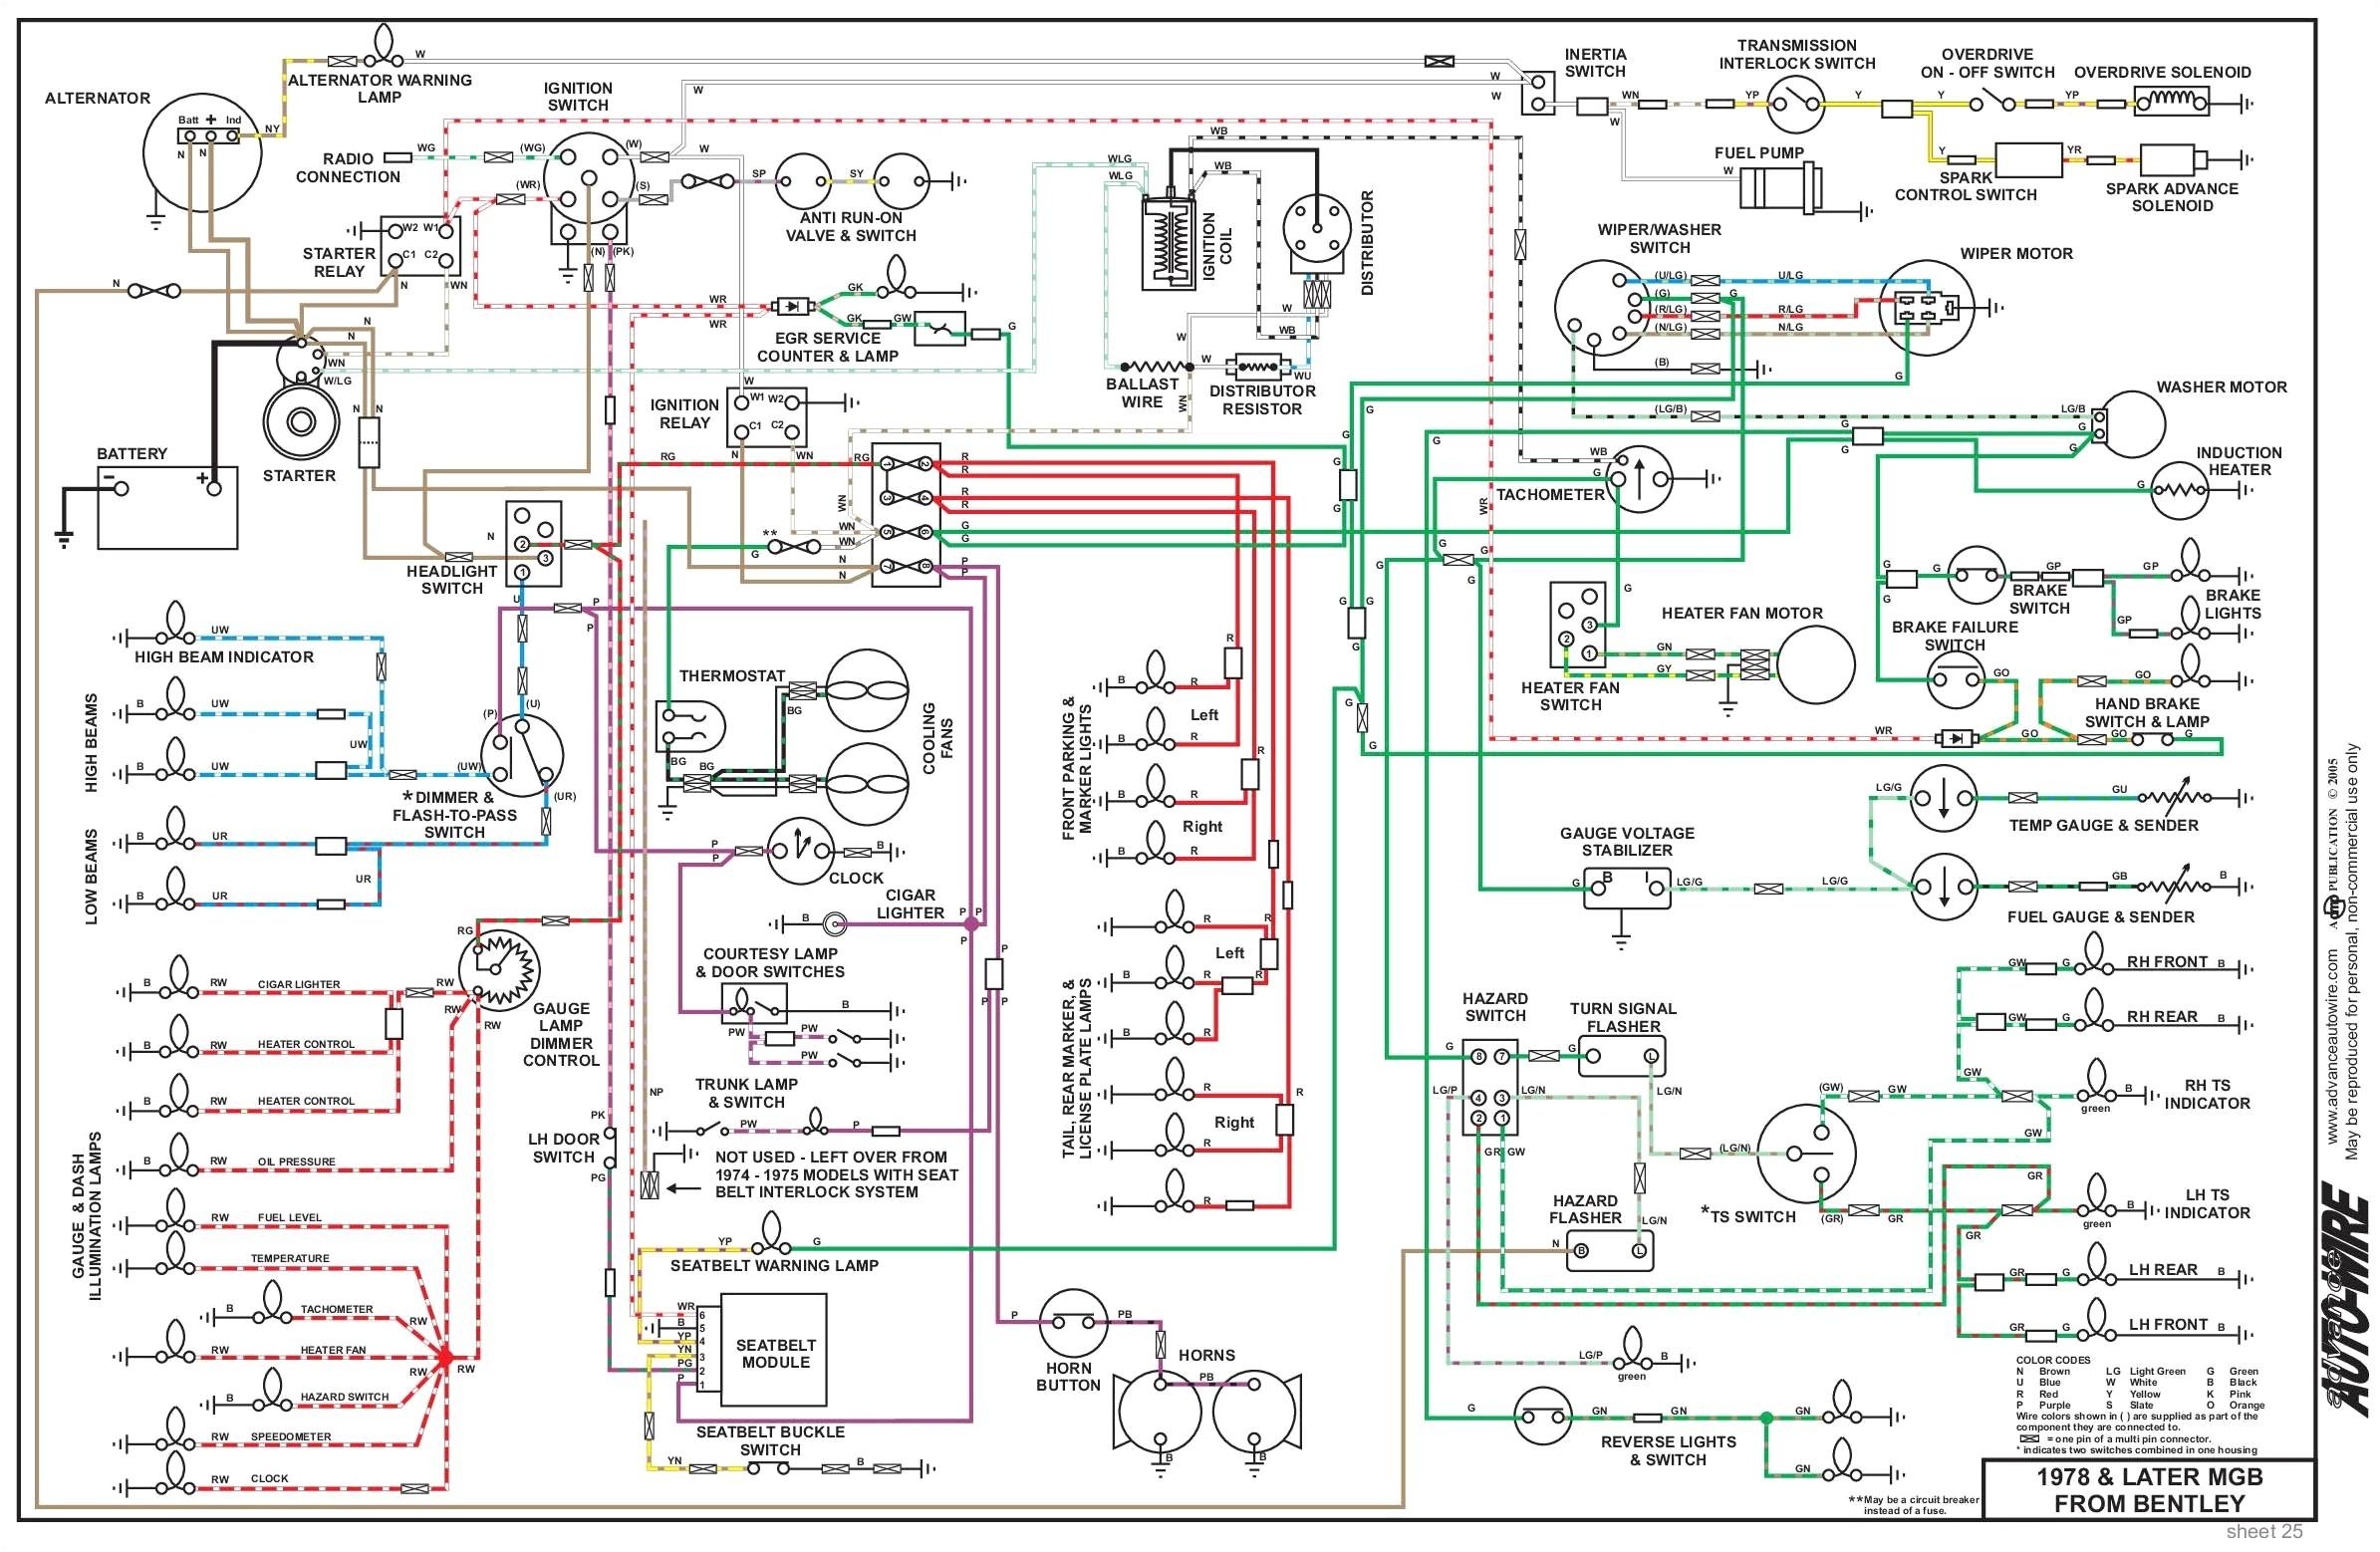 1978 mgb wiring harness installation wiring diagram expert 1977 mgb wiring harness diagram